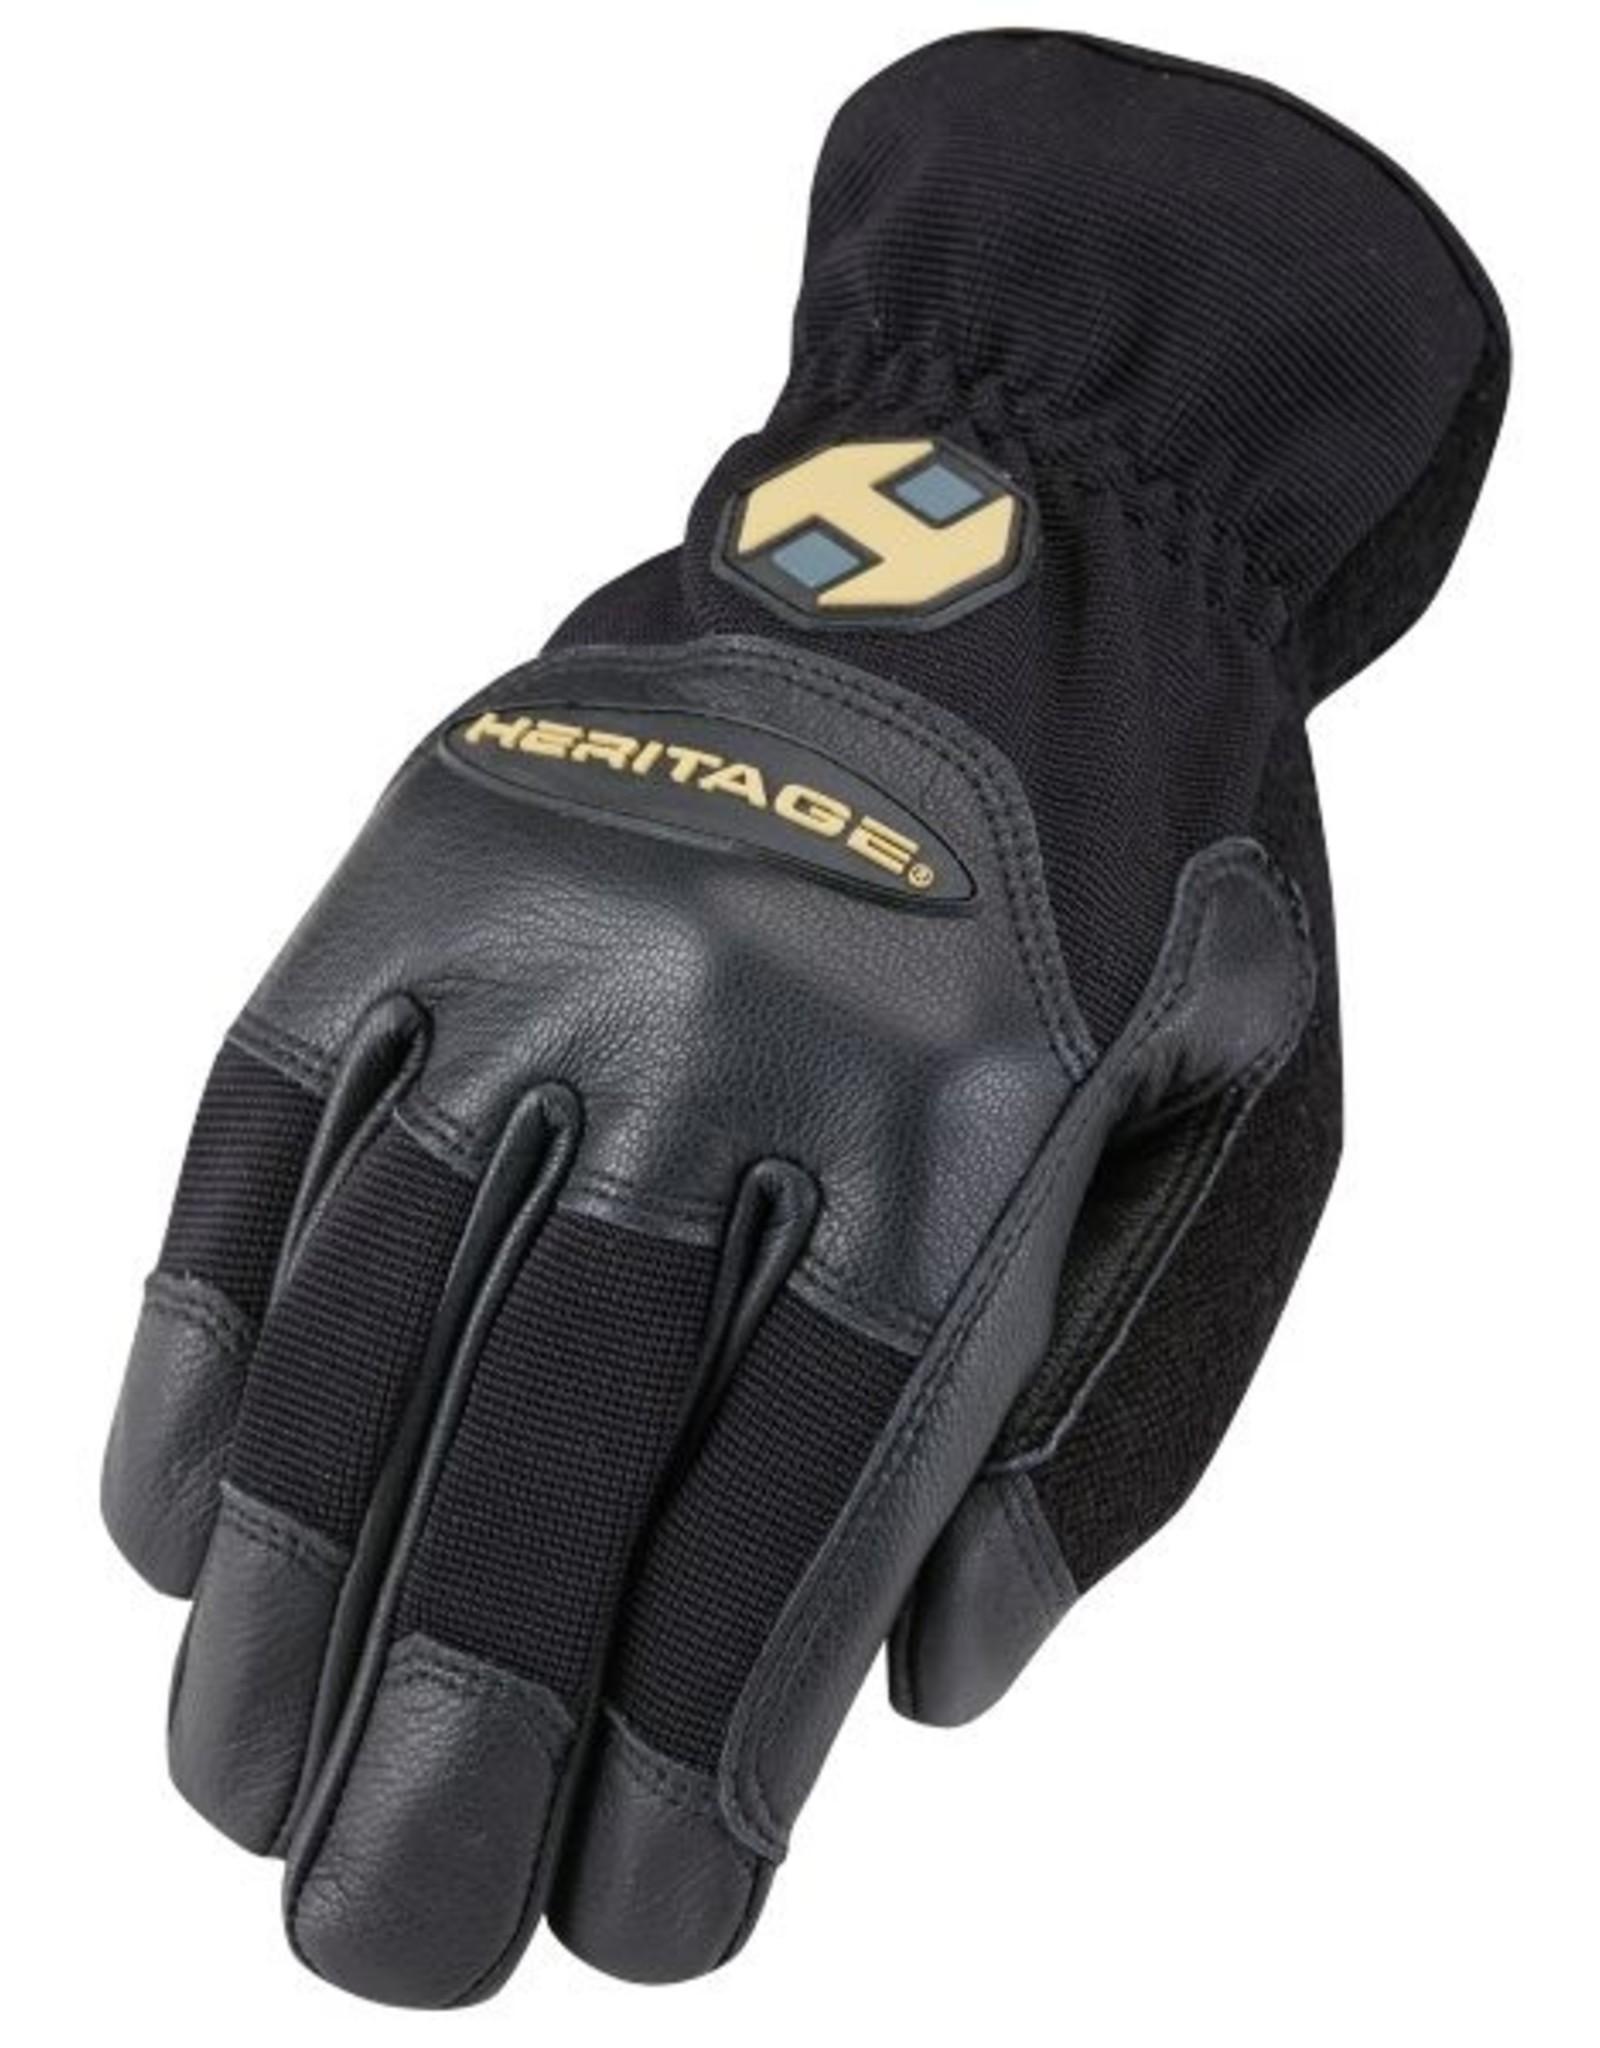 Heritage Trainer Gloves